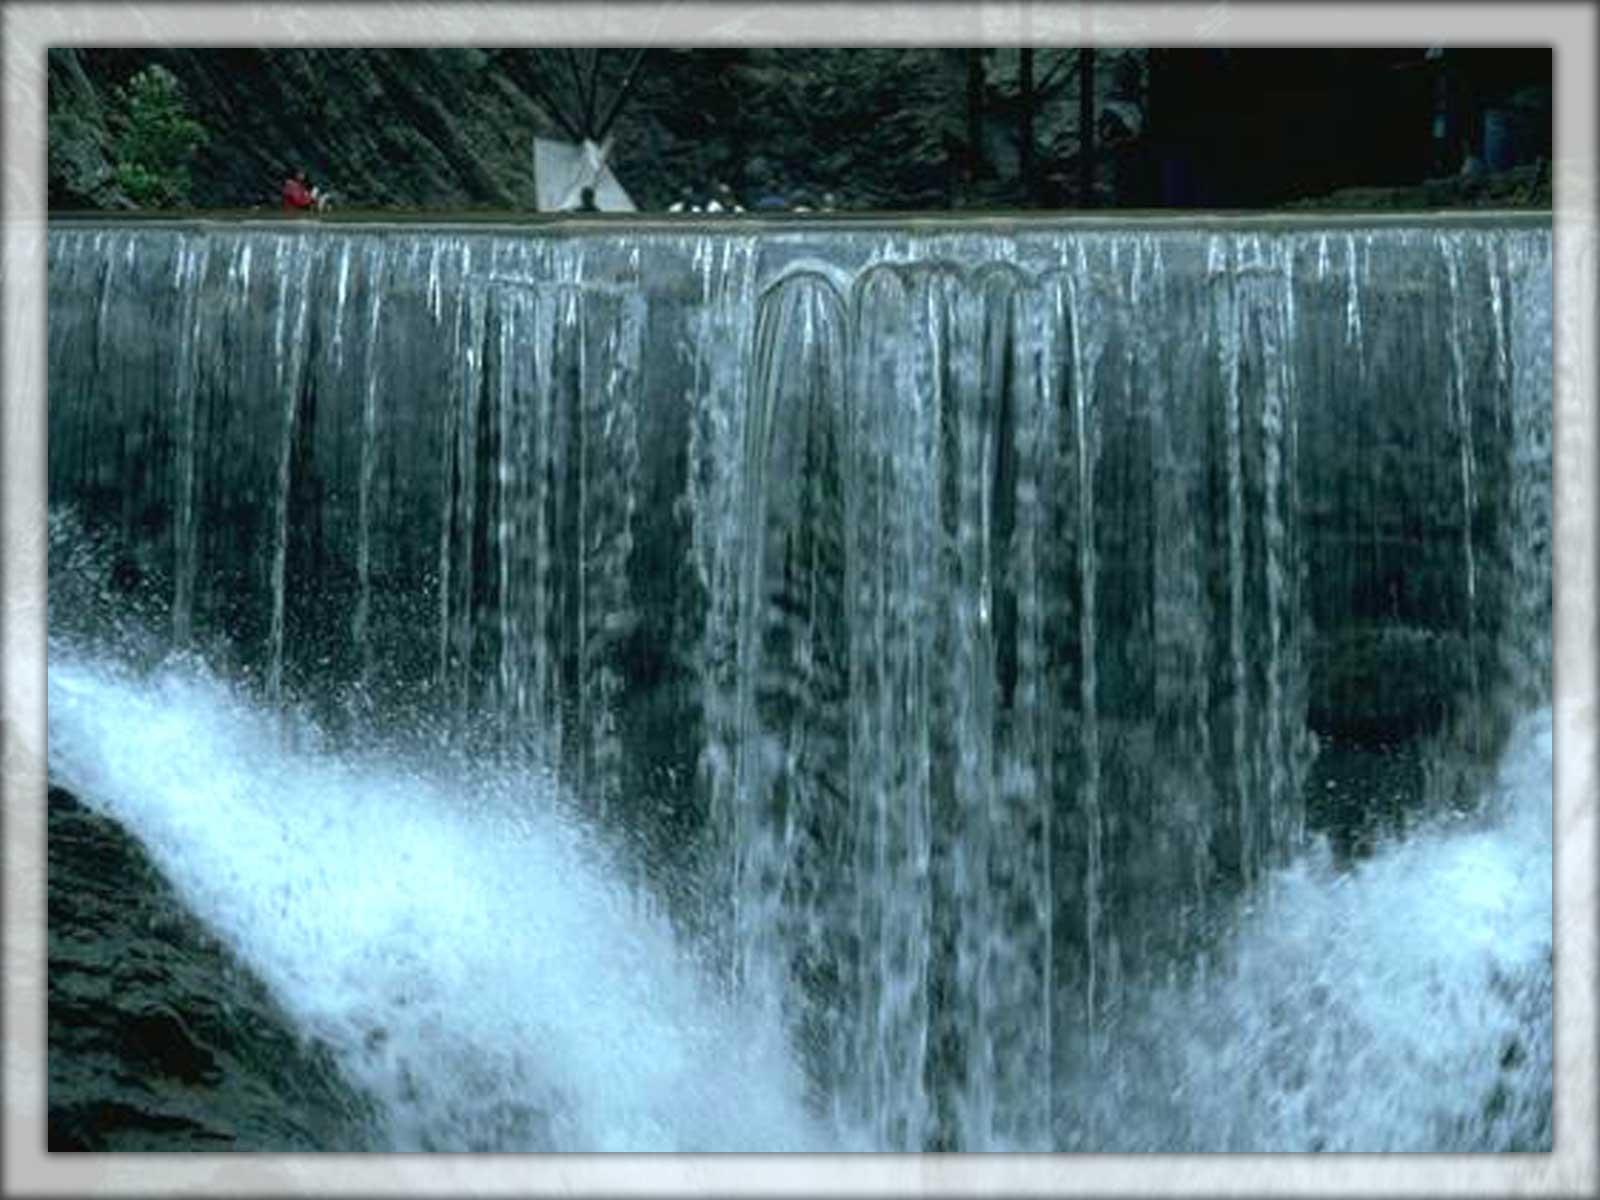 Hd Fall Wallpapers 1080p Waterfalls Hd Desktop Wallpapers Waterfalls Hd Desktop